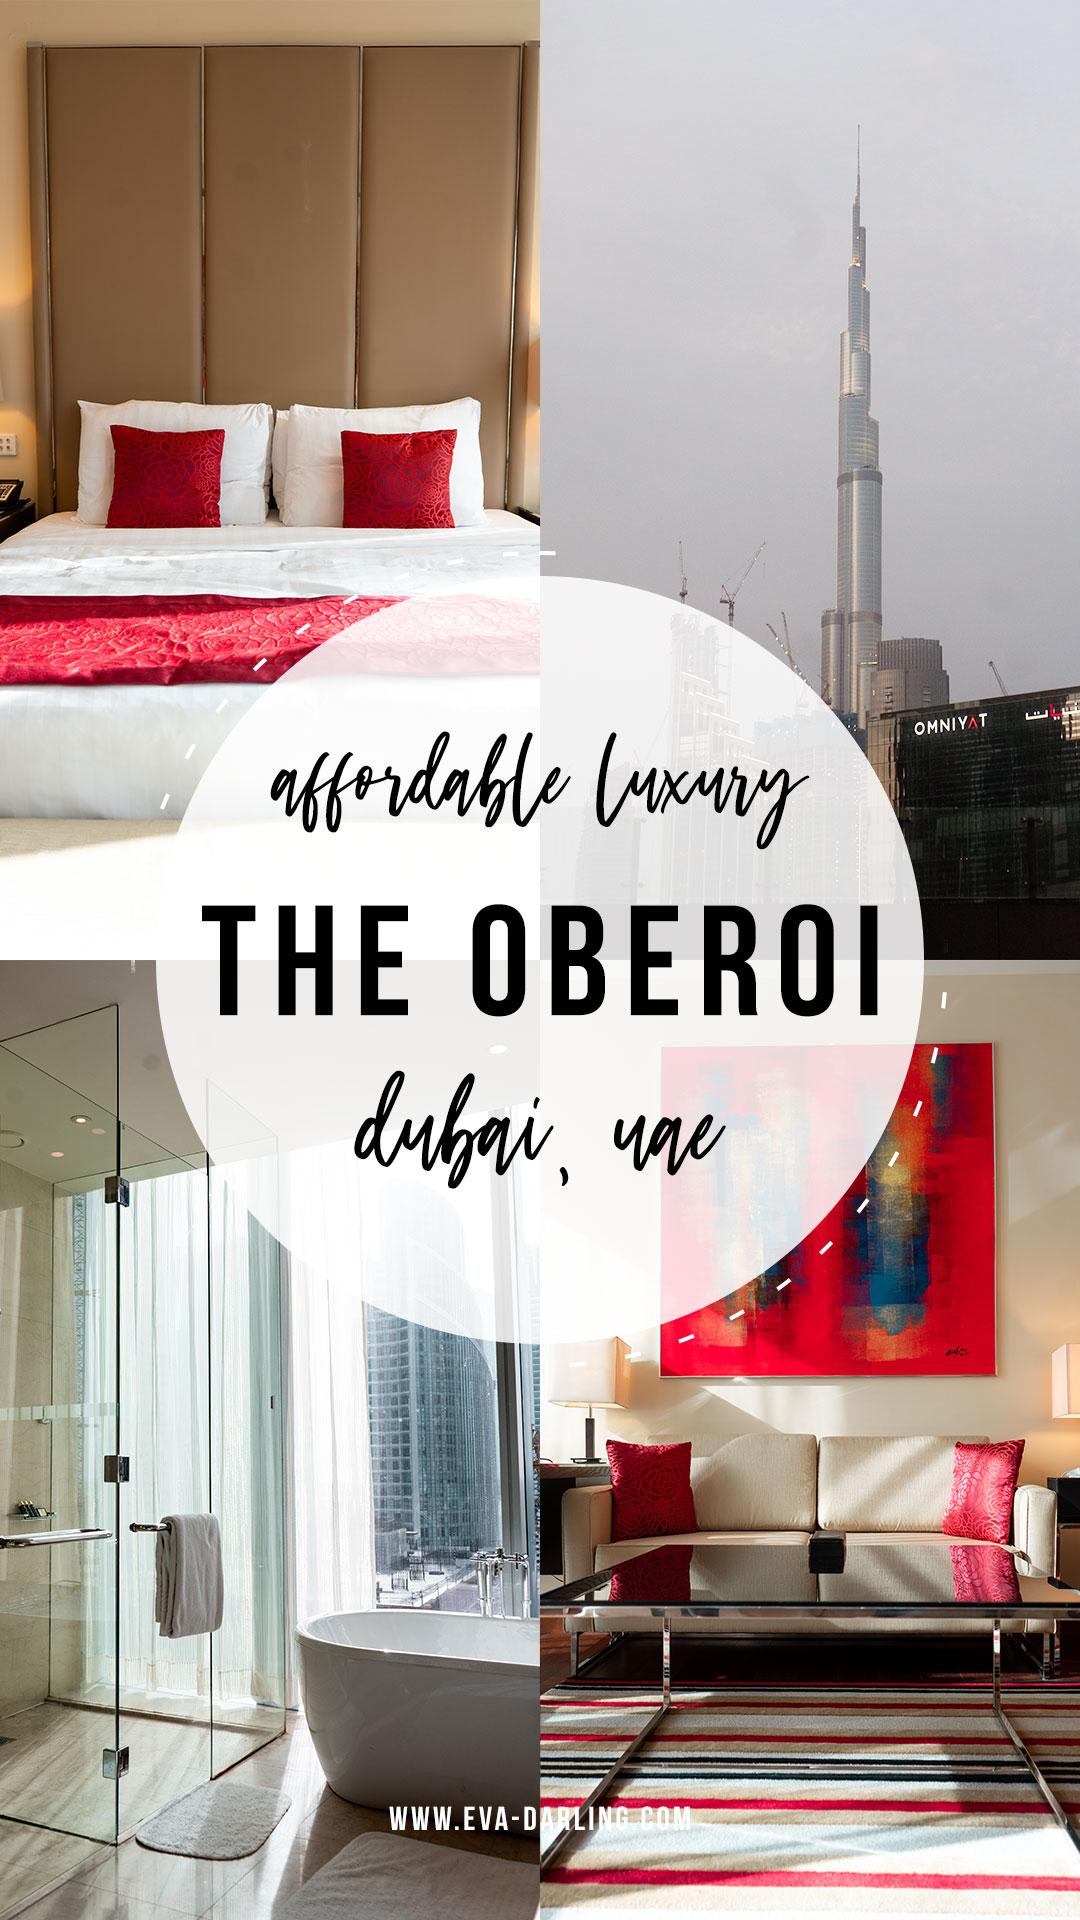 the oberoi dubai uae affordable luxury hotel business bay king bed burj khalifa